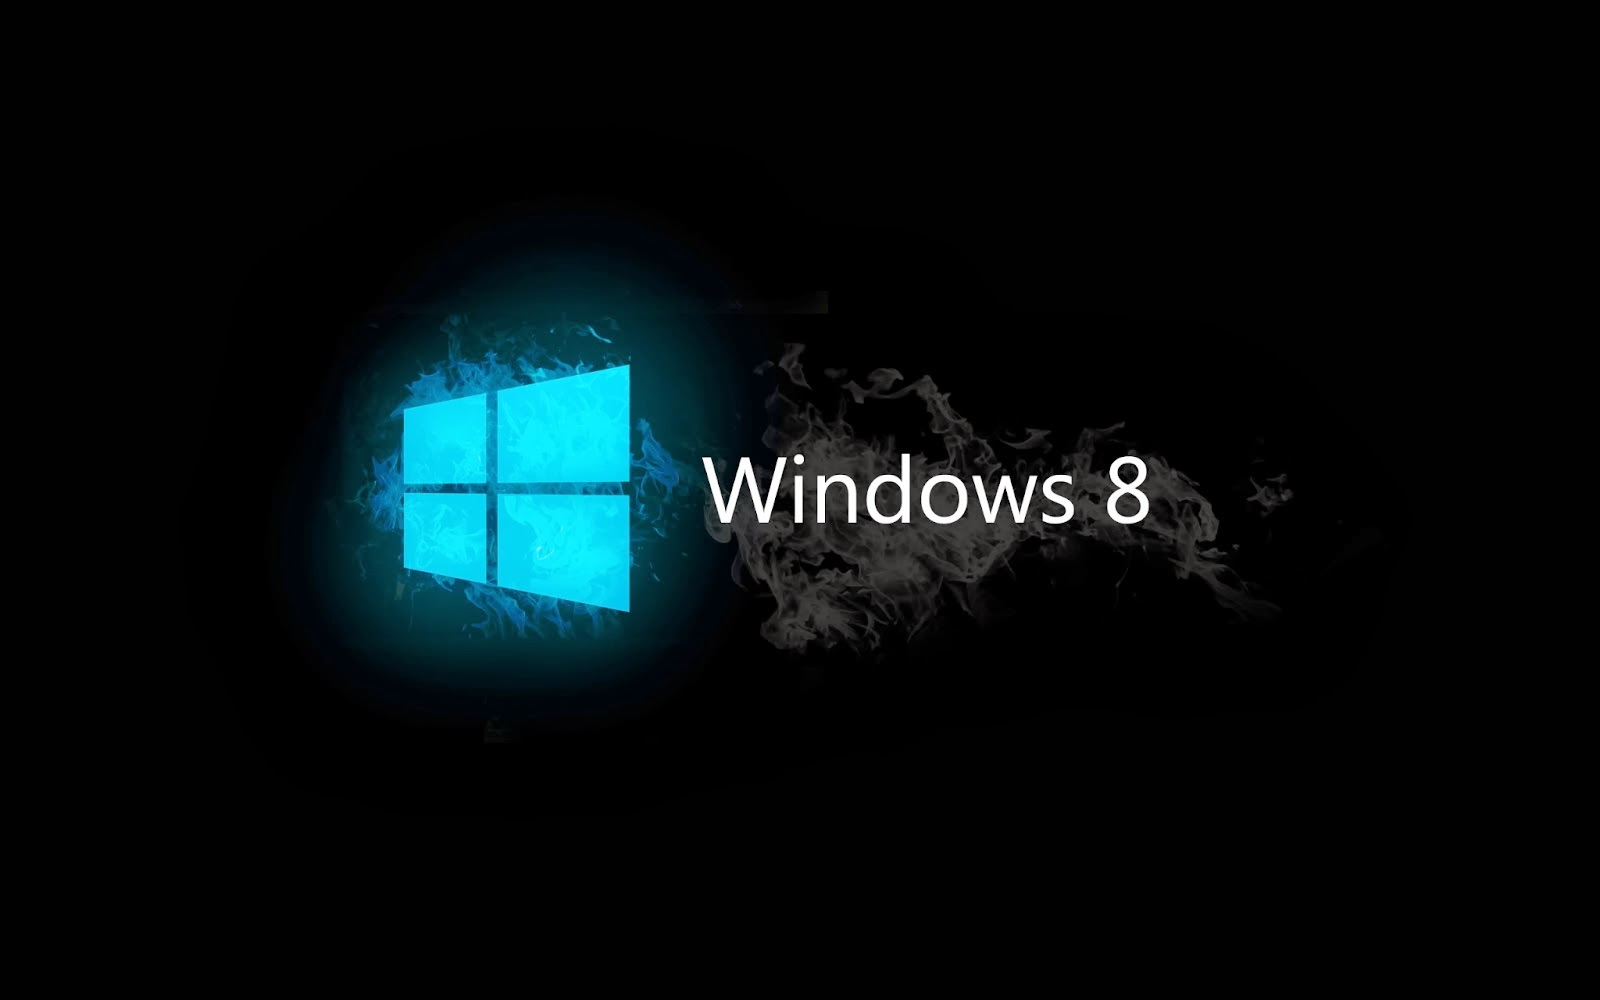 Dropbox download windows 8